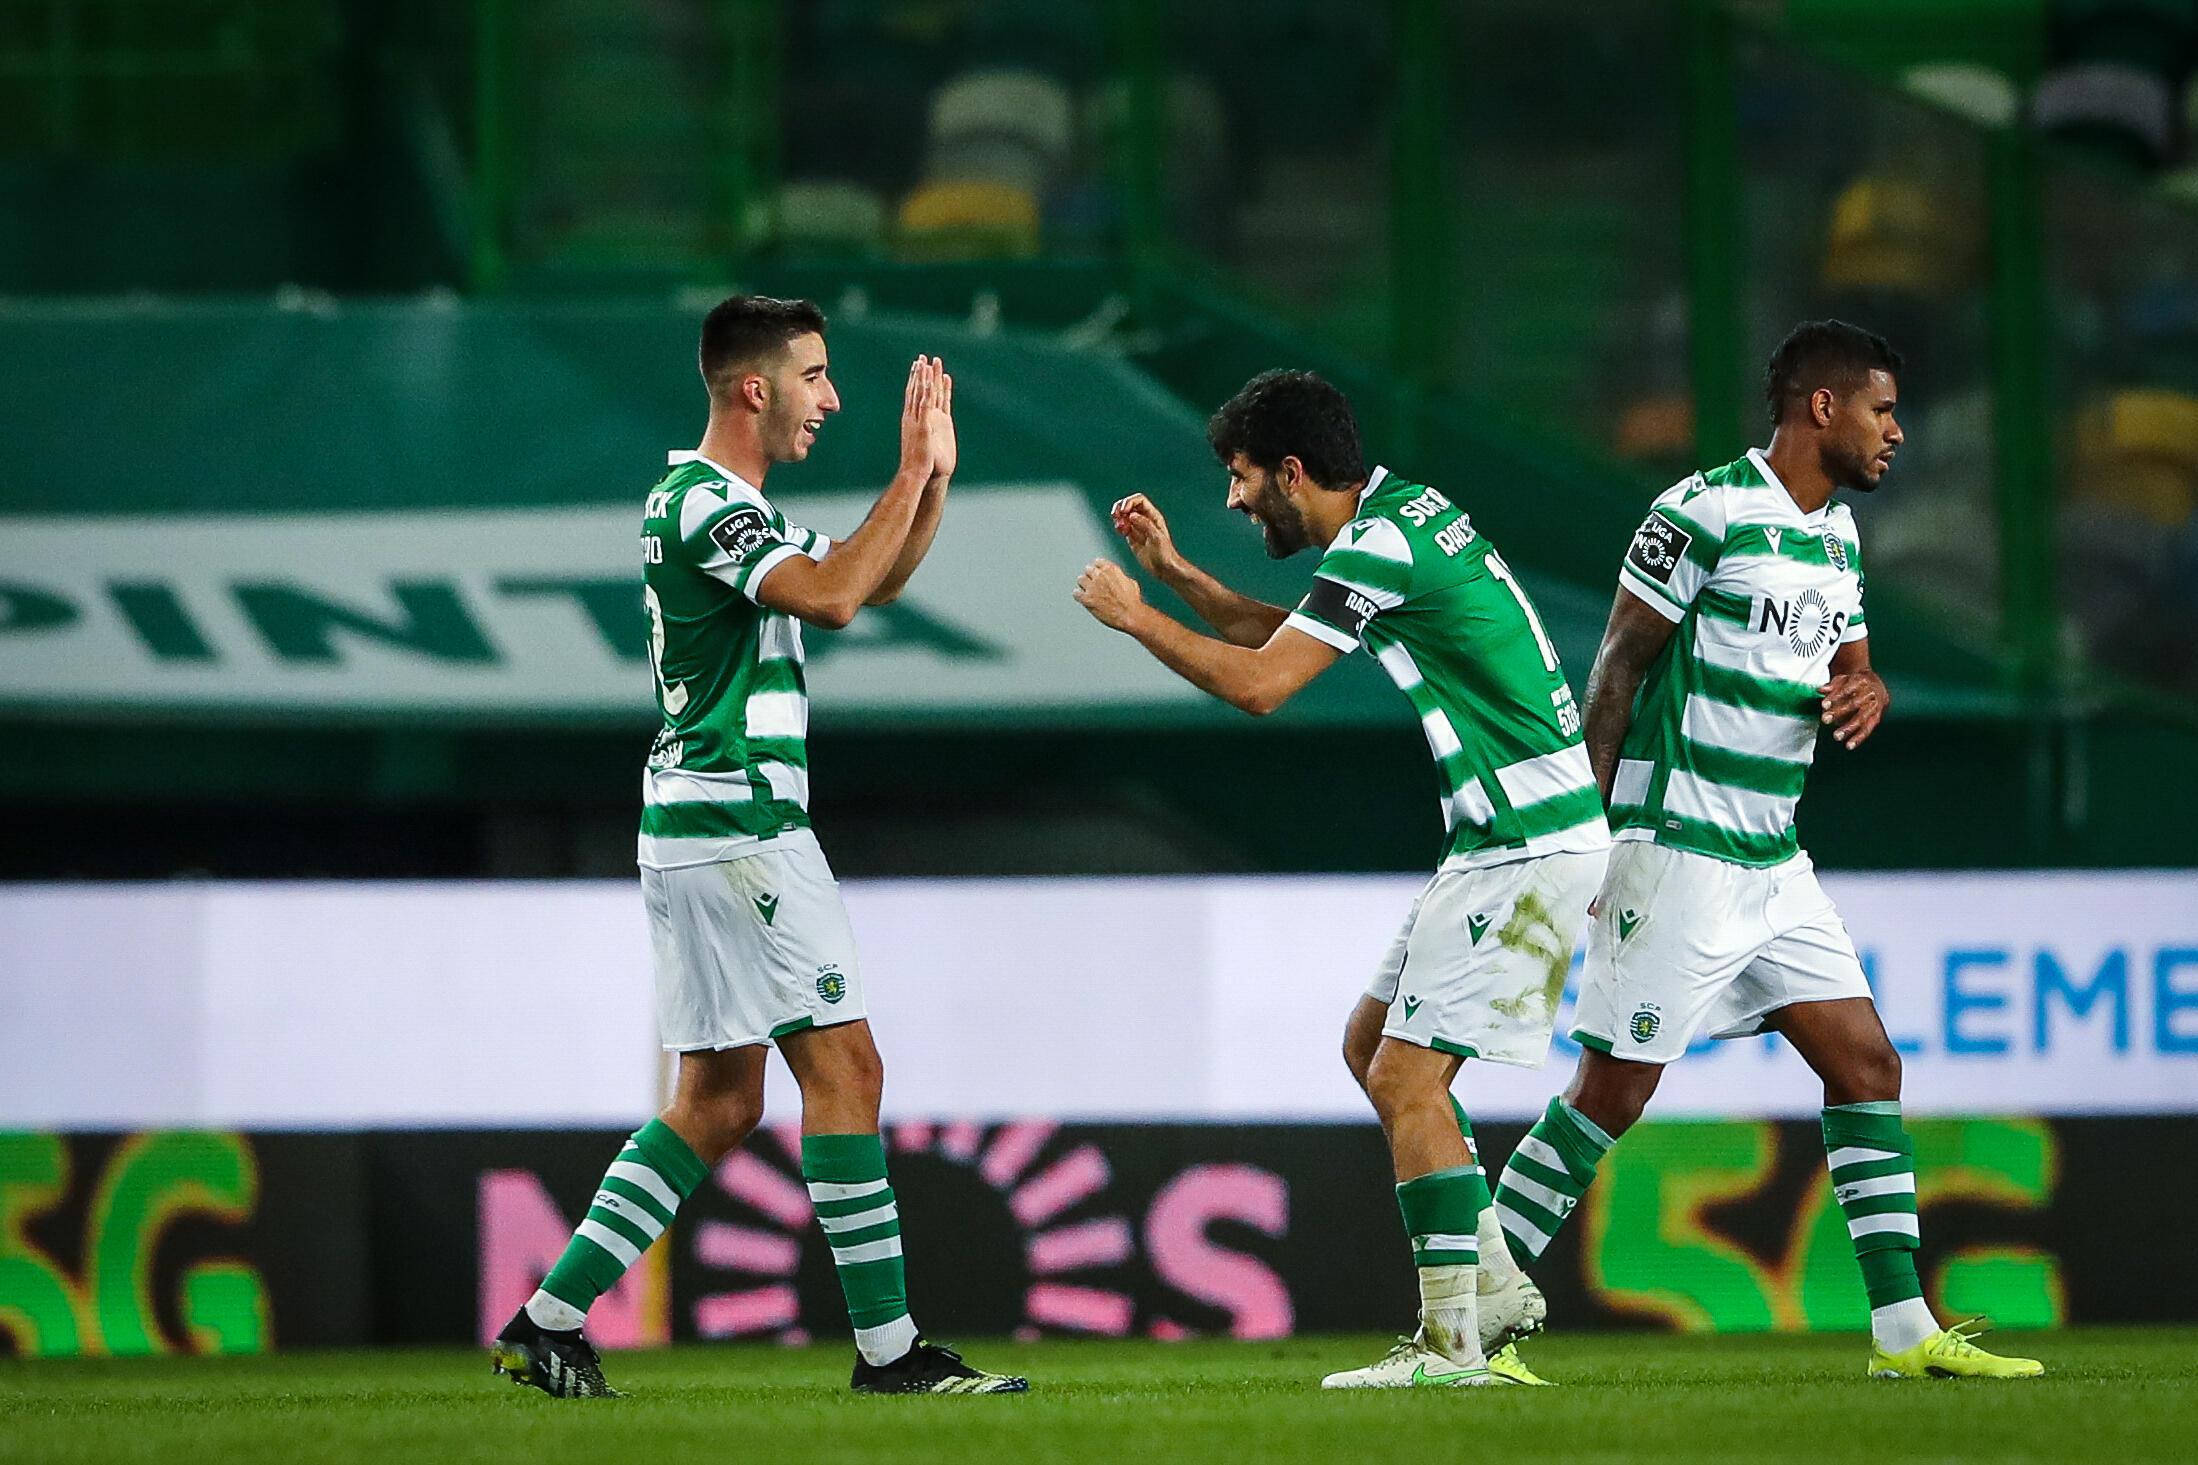 Gonçalo Inácio - Sporting CP - Liga Portuguesa - Futebol - Desporto - Football - Sporting Clube de Portugal